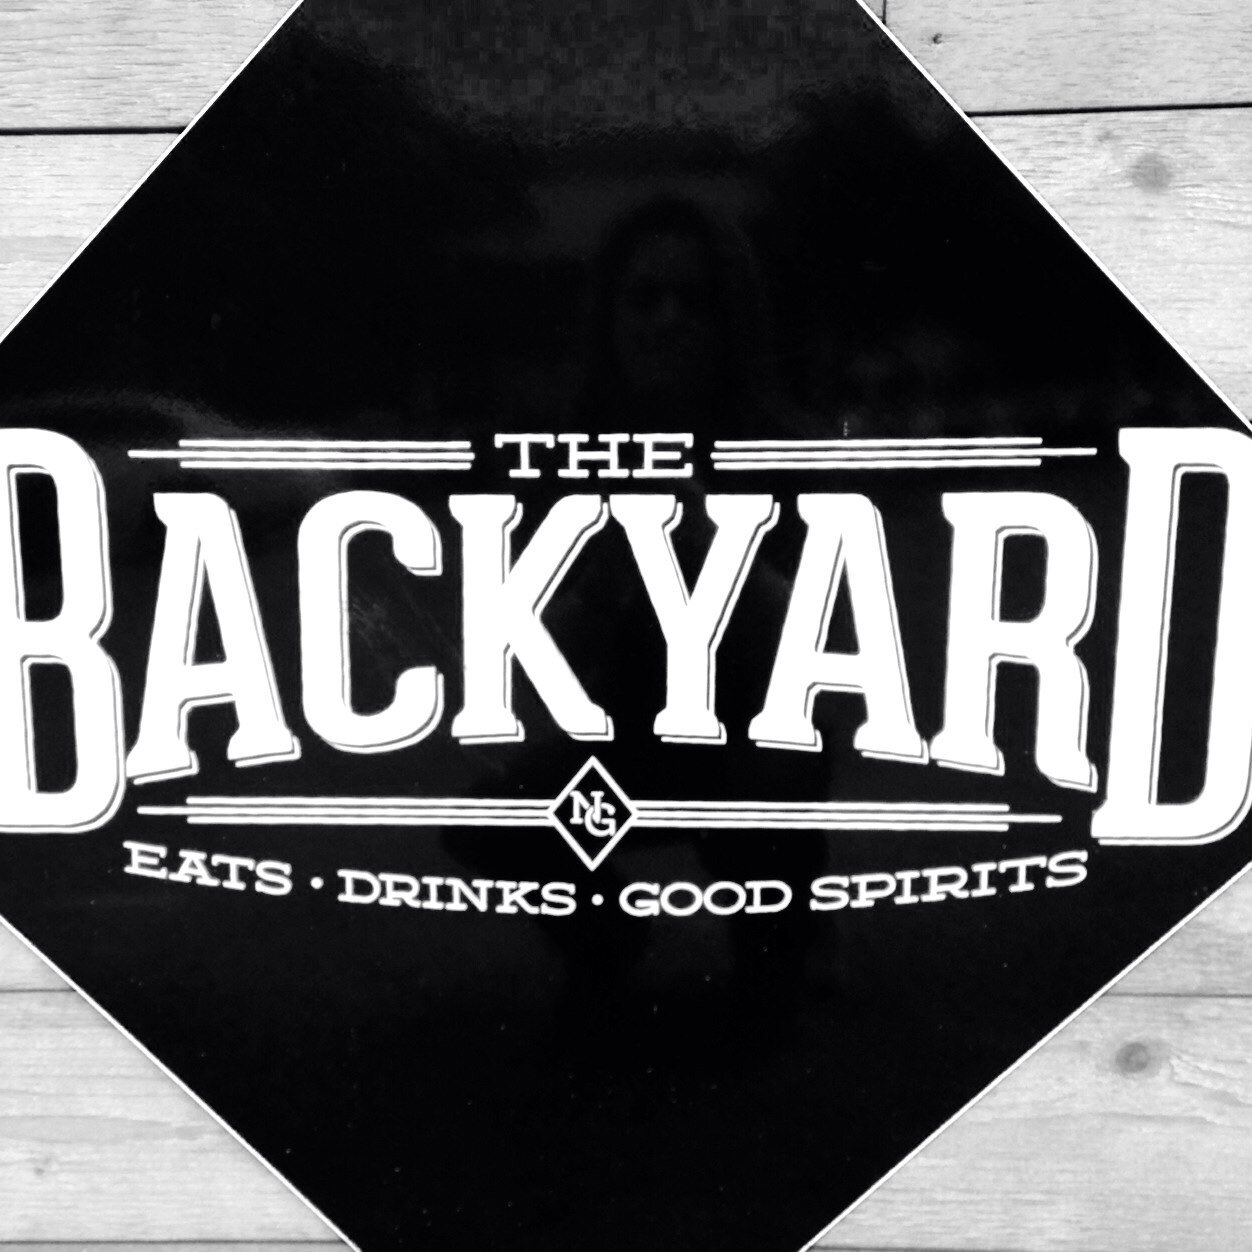 backyard northgate backyardbcs twitter